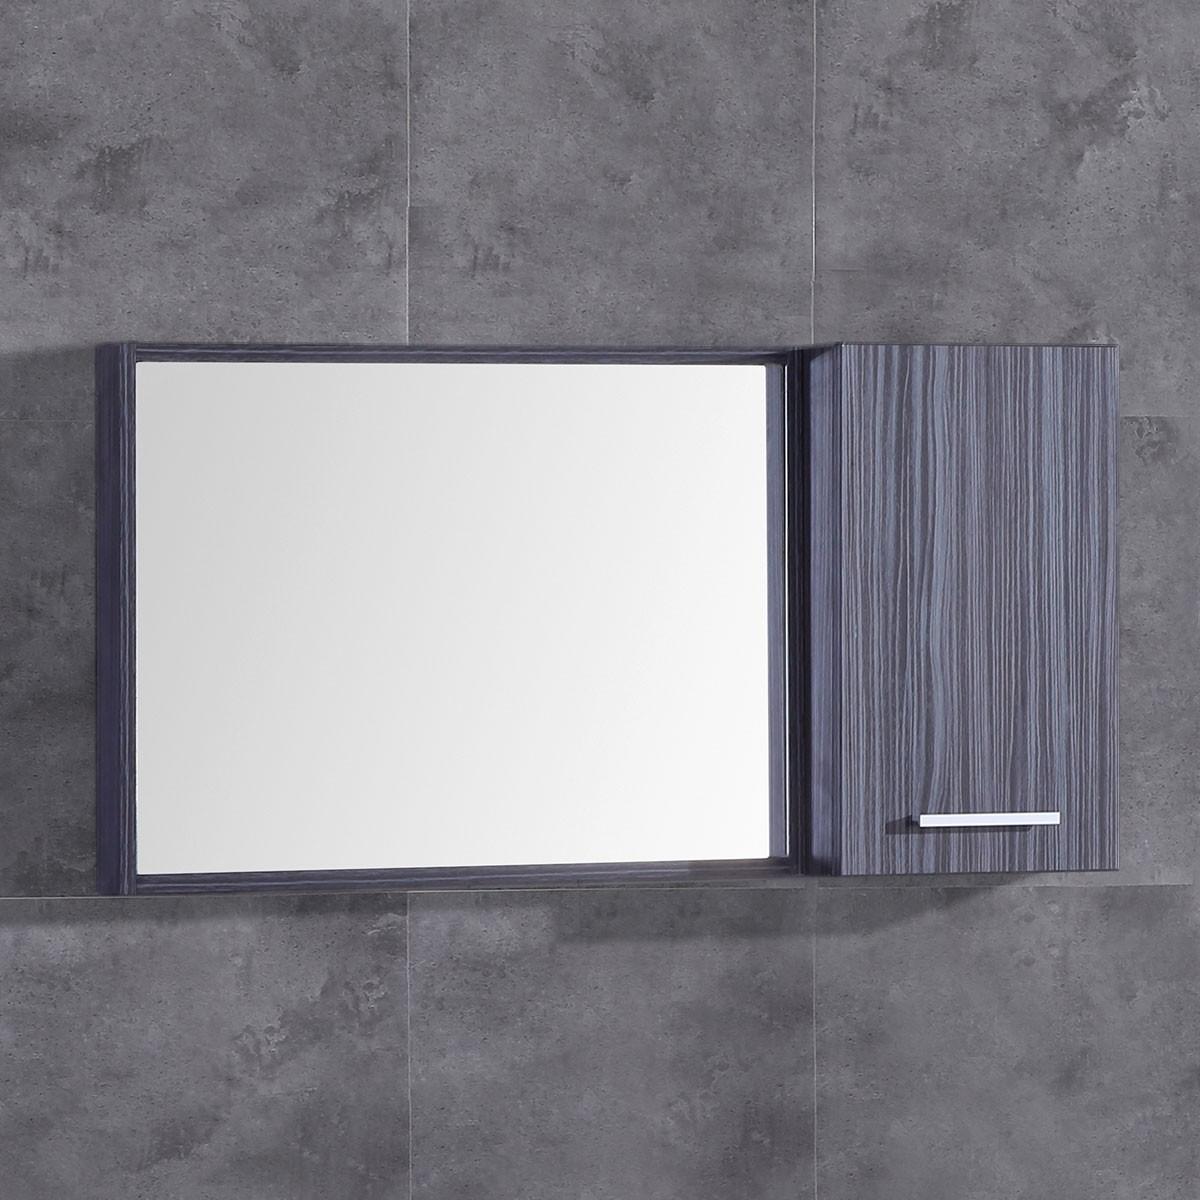 40 x 28 po Miroir pharmacie (DK-T5041-M)